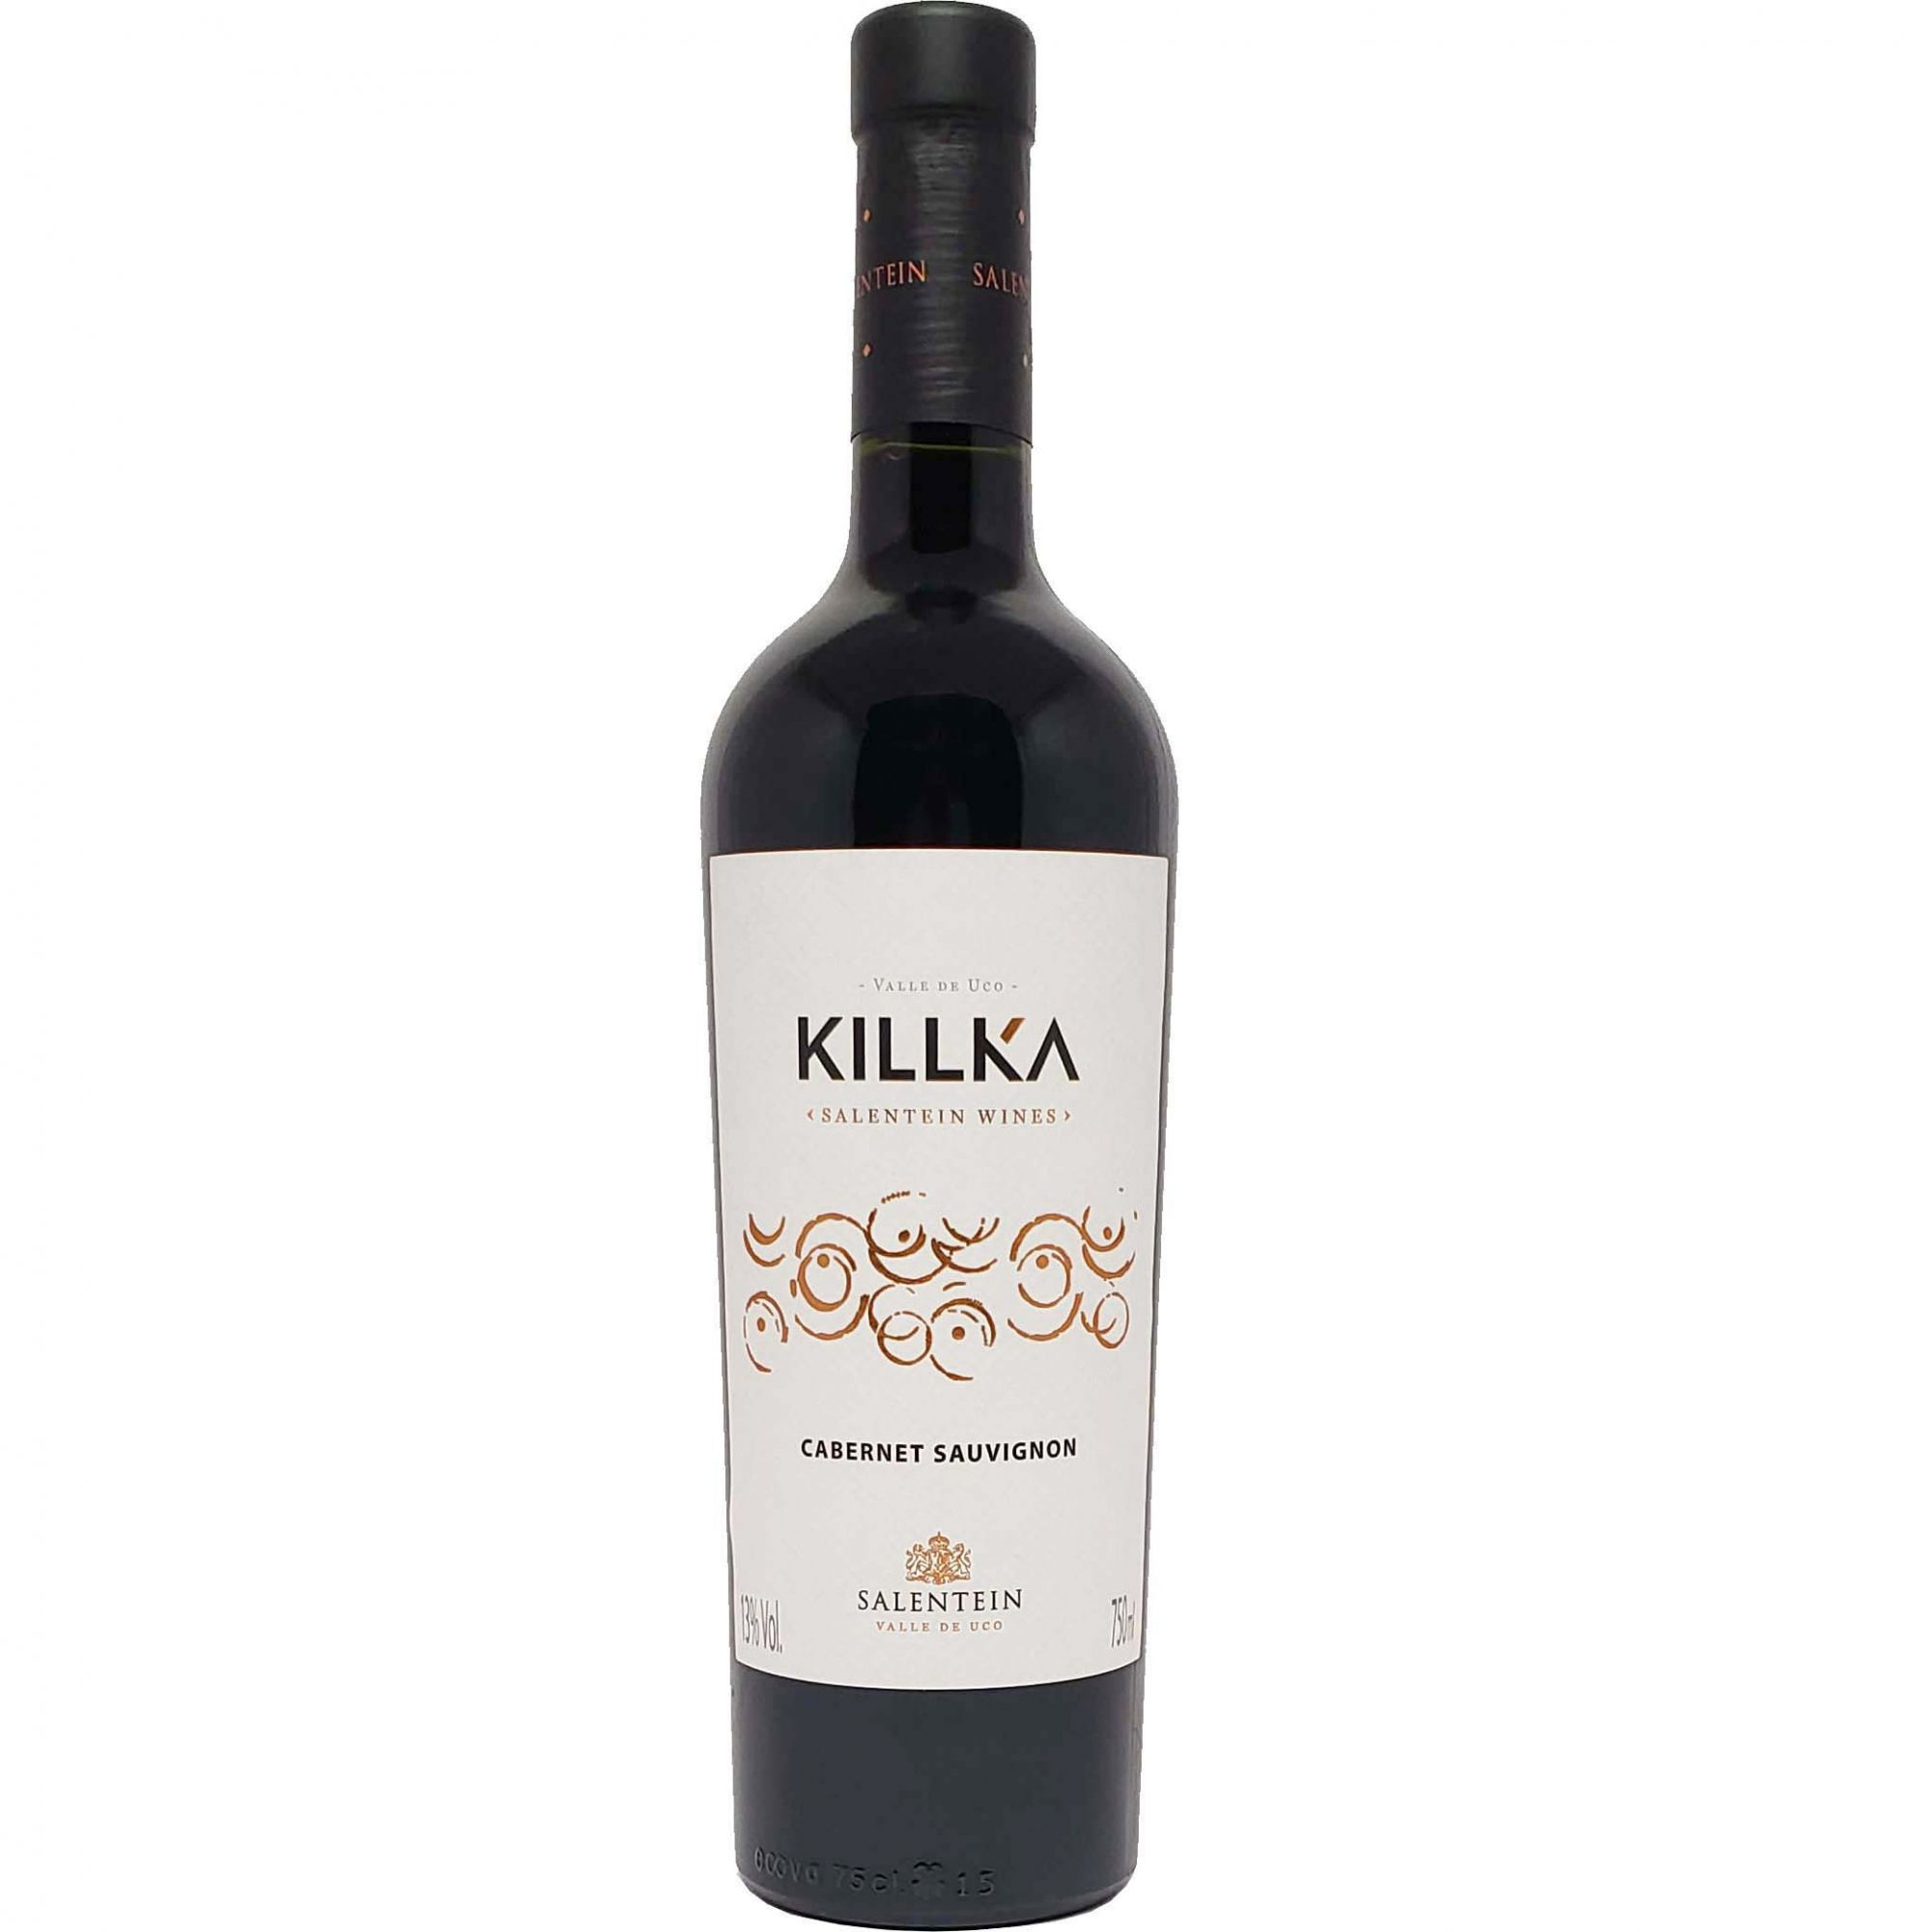 Vinho Tinto Killka Salentein Cabernet Sauvignon - 750ml -